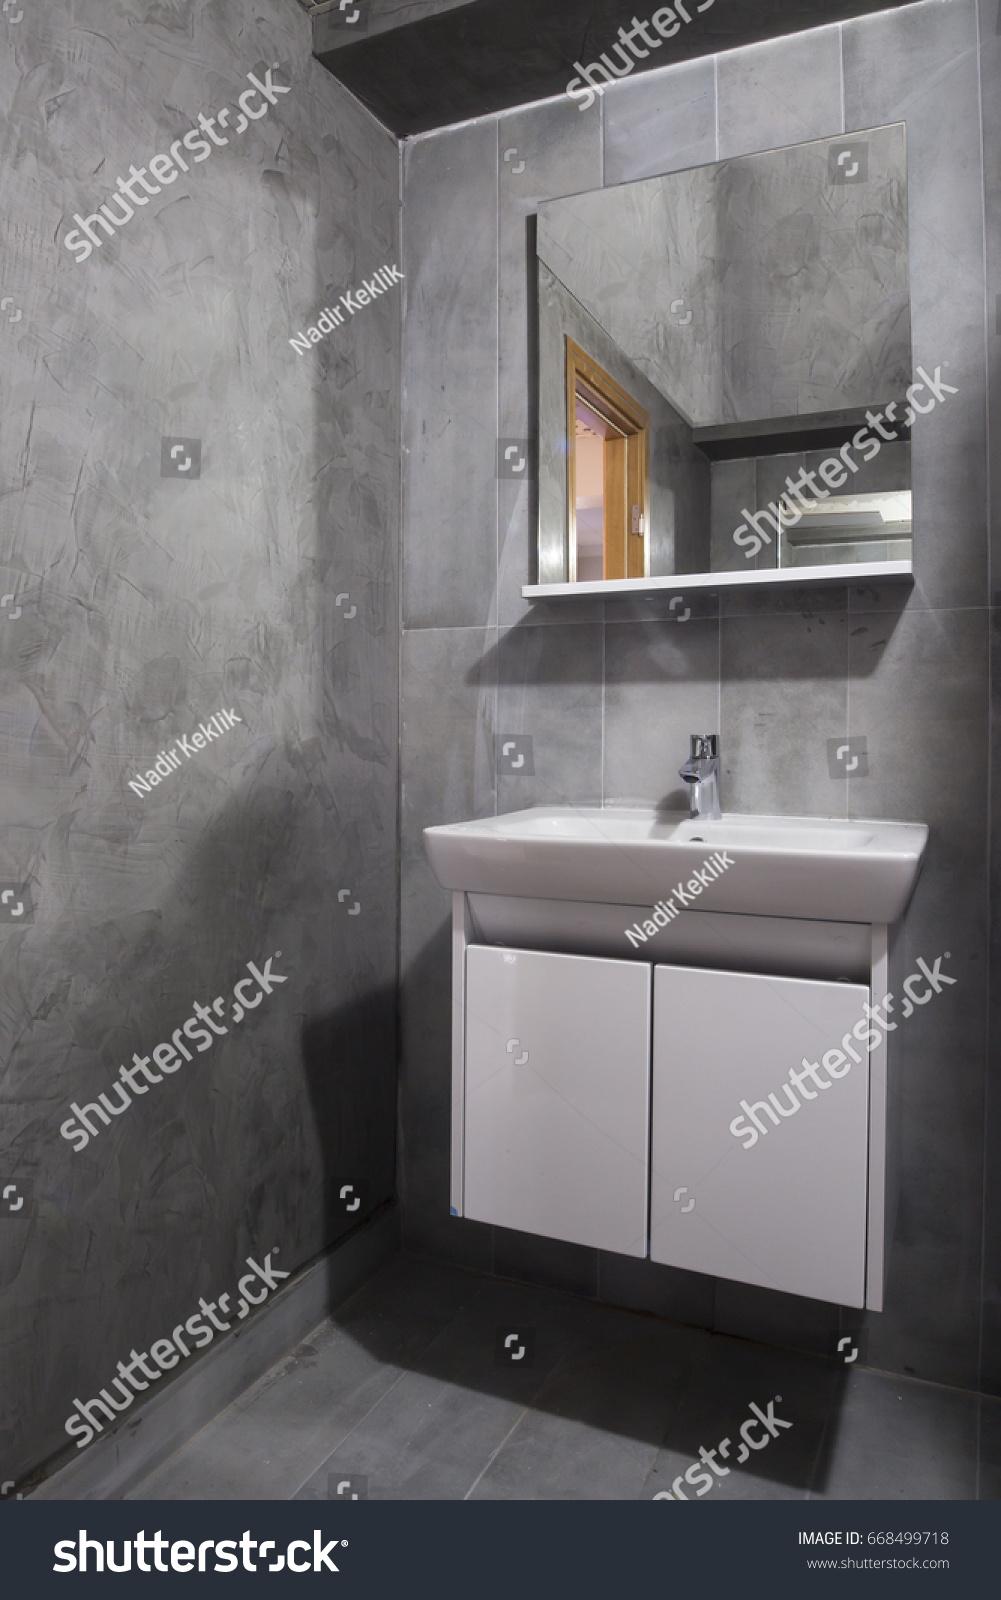 Grey Commercial Bathroom Design Stock Photo Edit Now 668499718